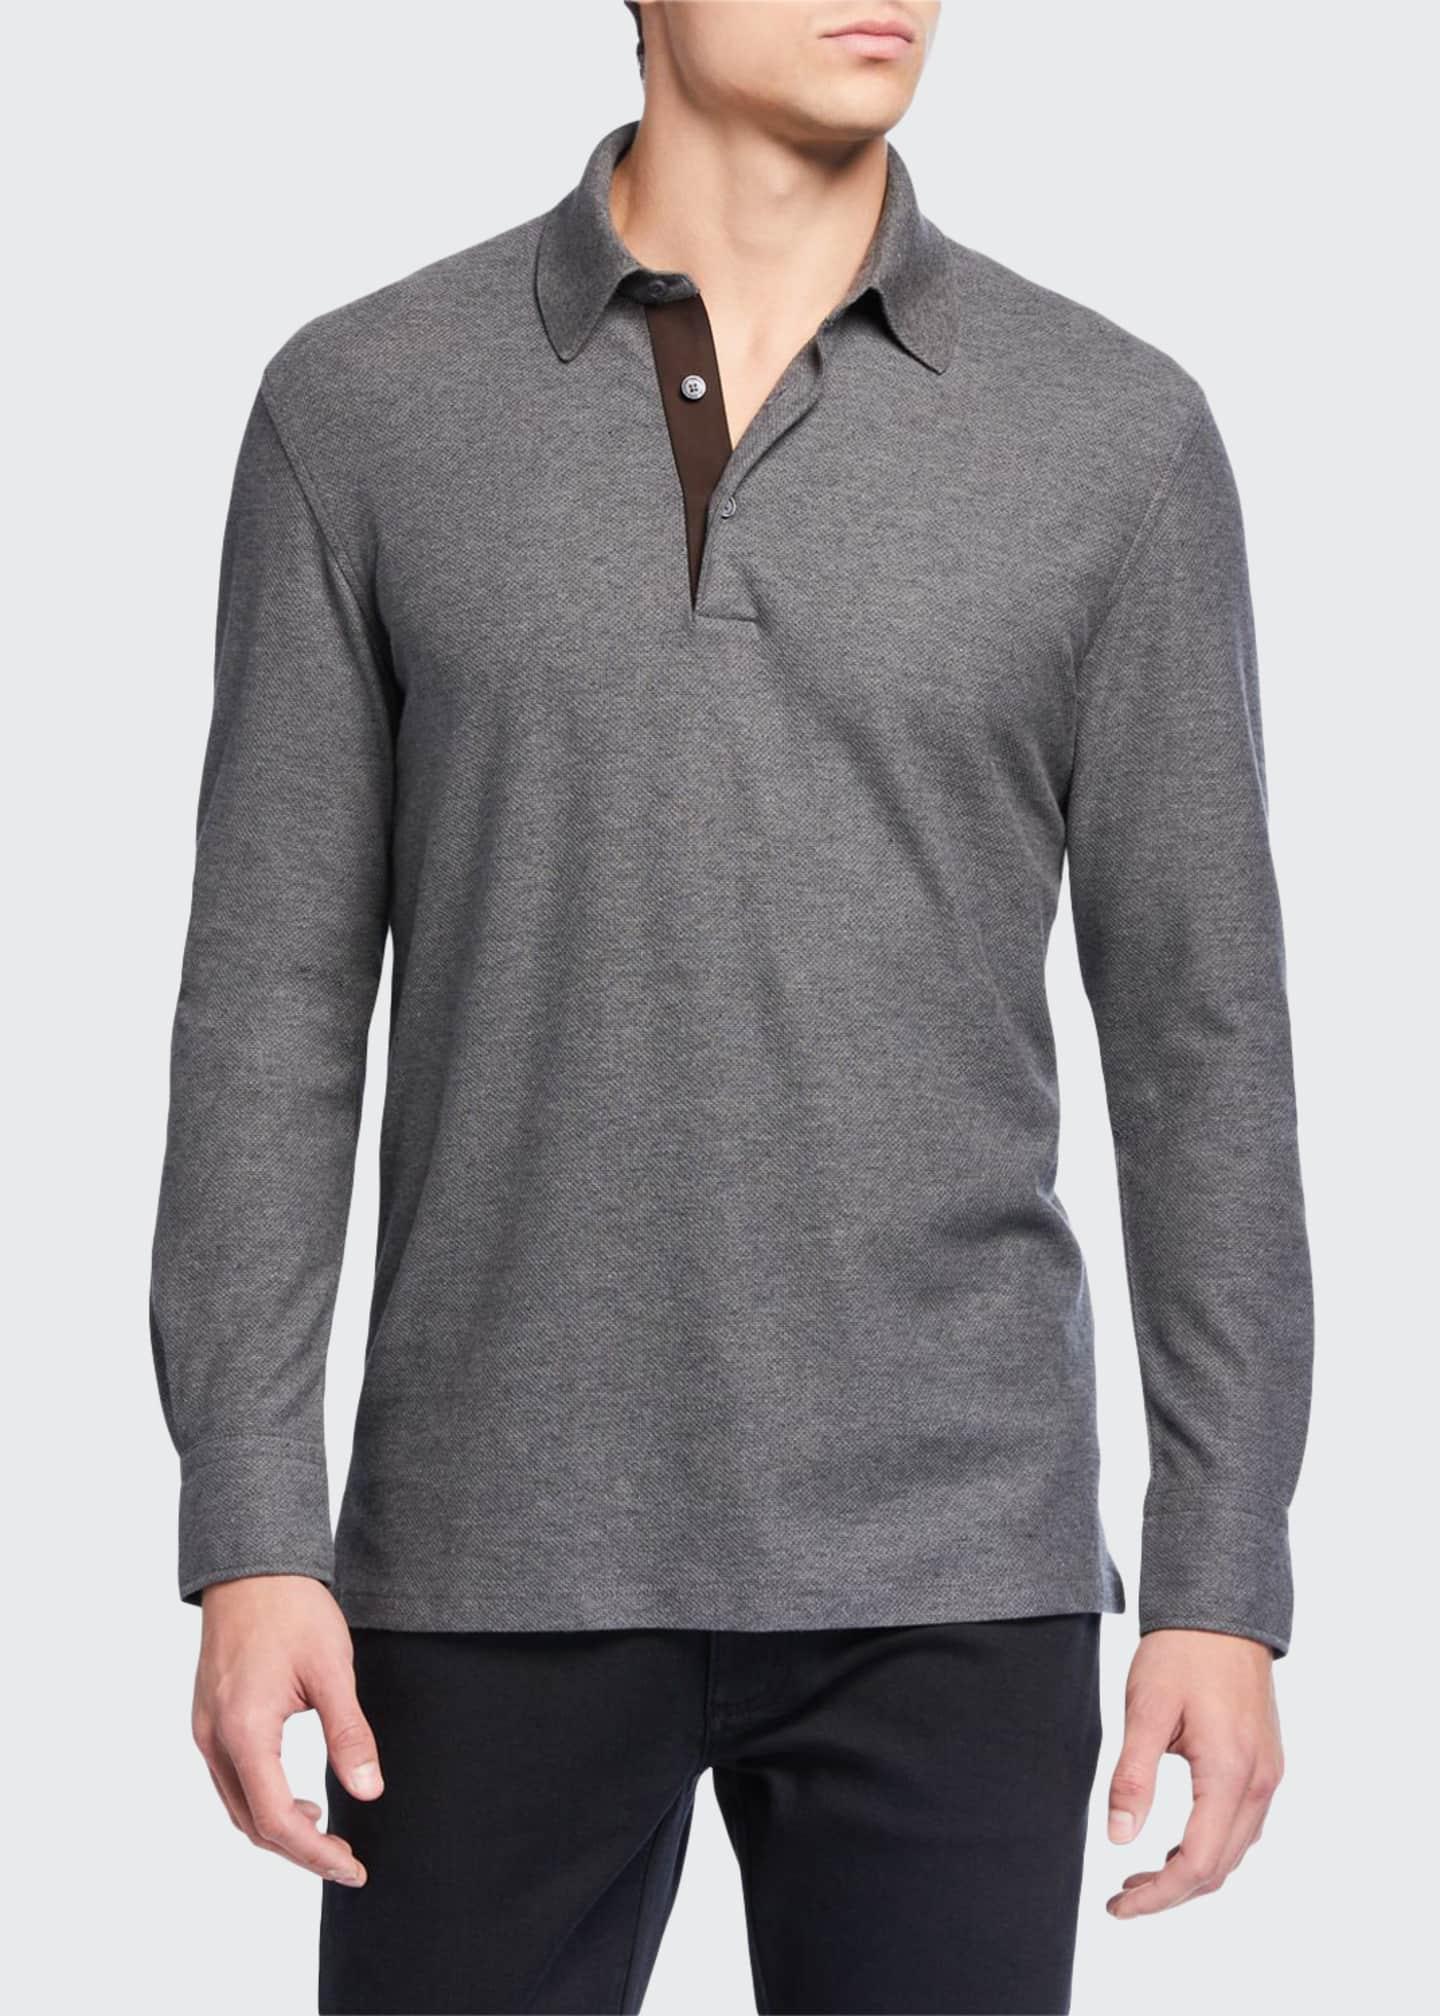 Ermenegildo Zegna Men's Cotton-Cashmere Polo Shirt w/ Leather